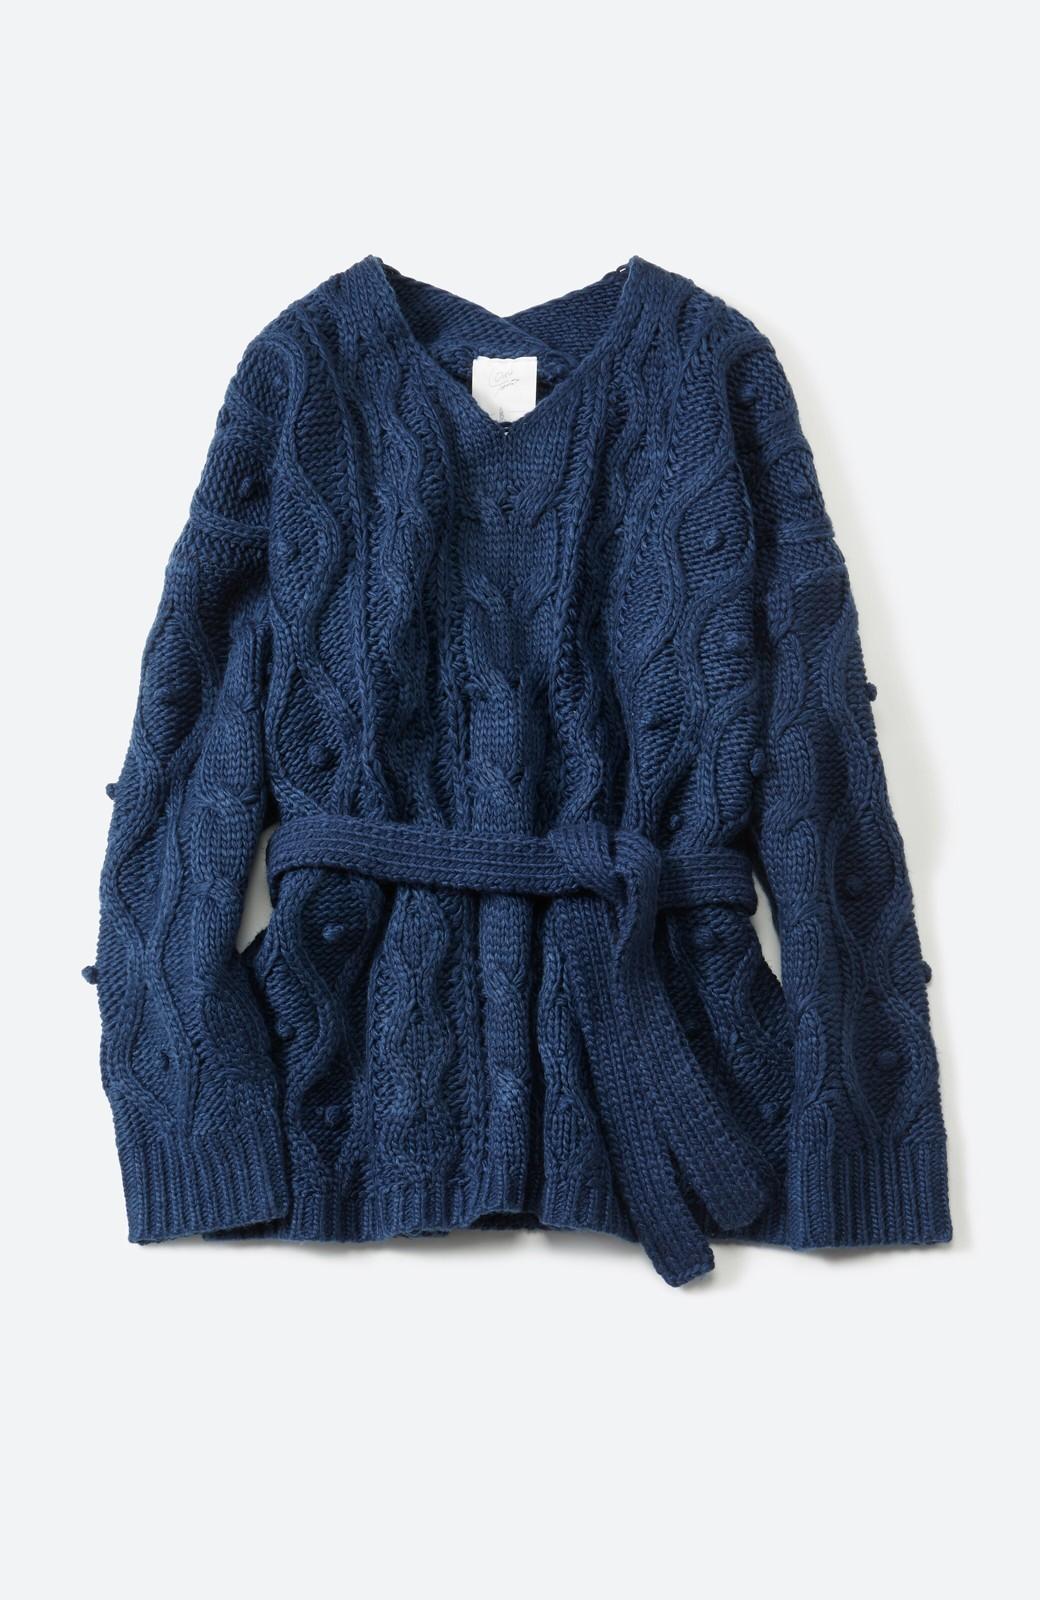 haco! <高橋愛さんコラボ>ラブ&ピースプロジェクト パプコーン編みのウエストマークケーブルニットトップス <ネイビー>の商品写真1